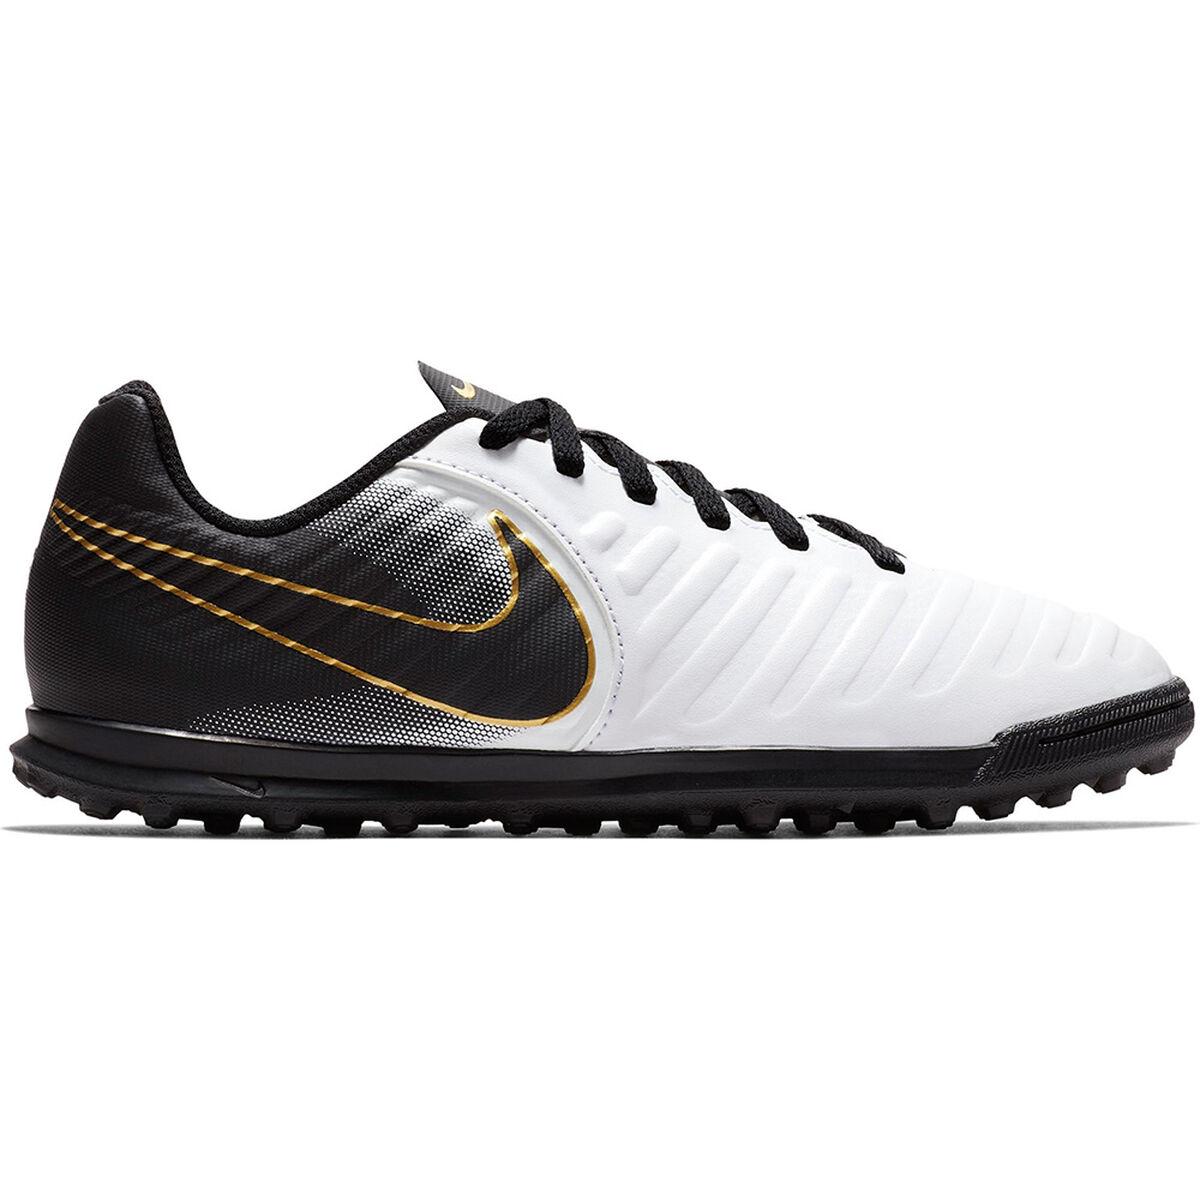 Zapatilla Baby Fútbol Nike Niño Ah7261-100